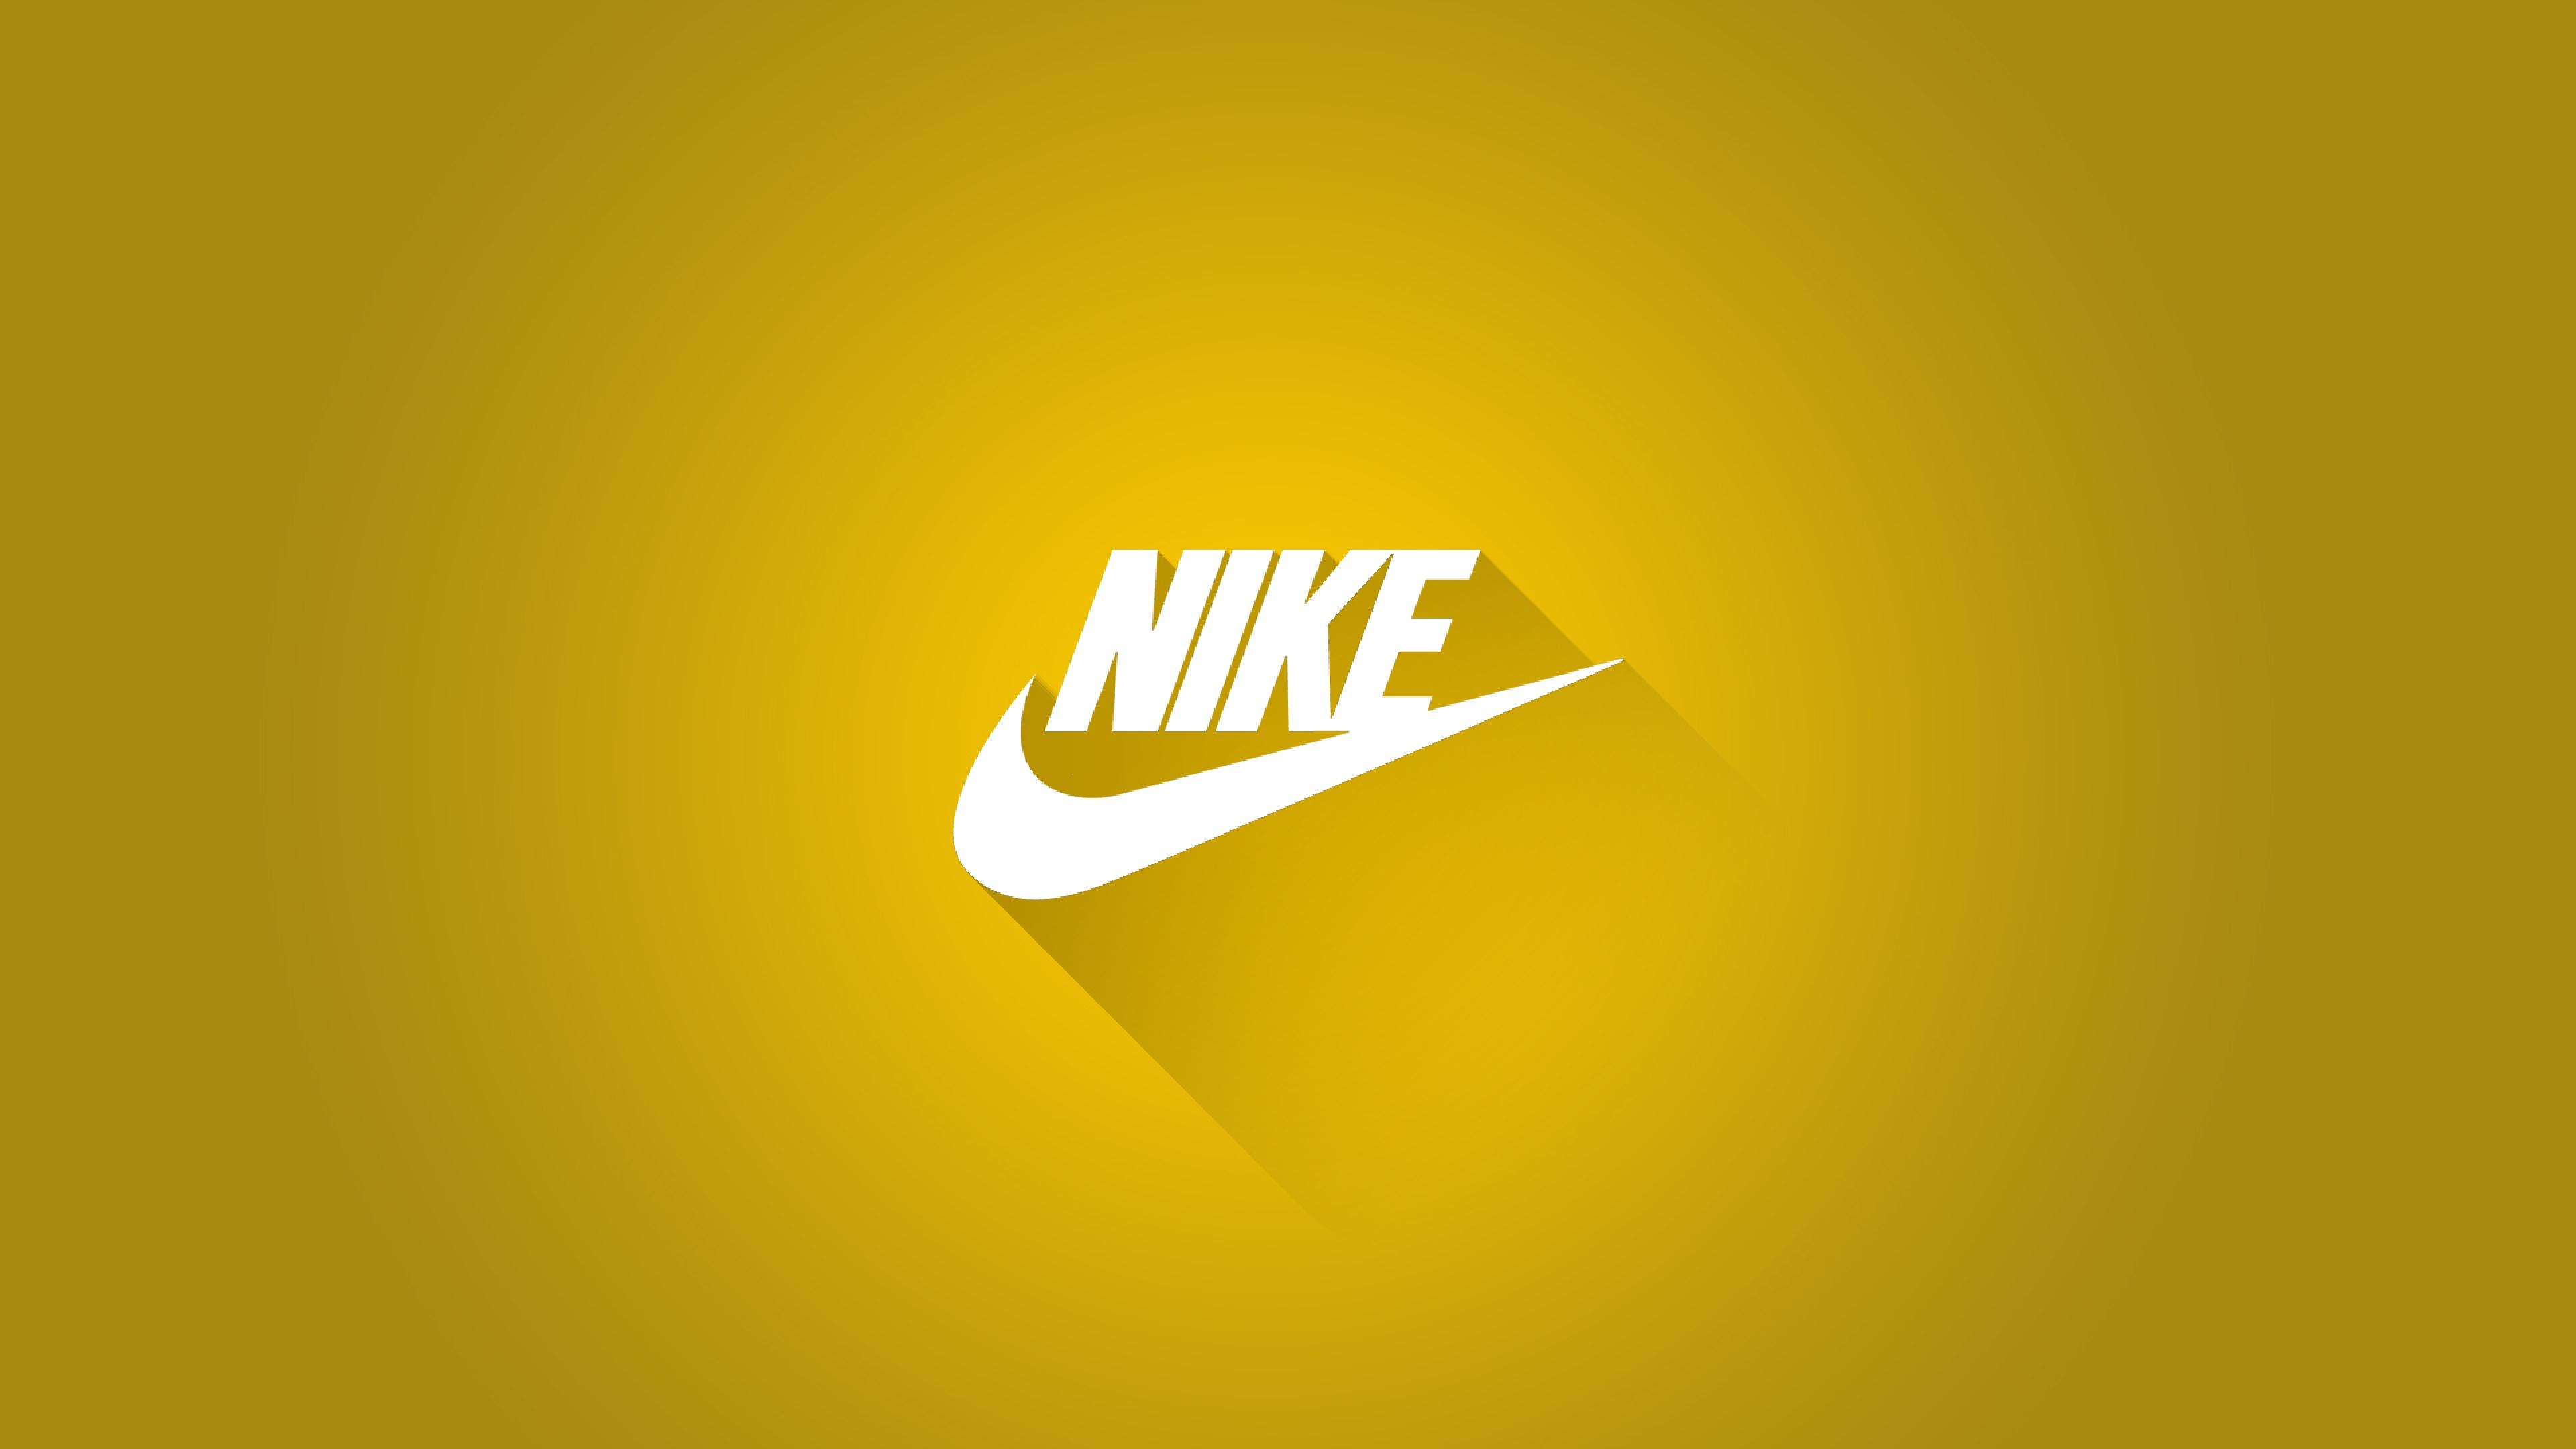 Nike Sport Wallpaper 4k: Nike Logo, HD Logo, 4k Wallpapers, Images, Backgrounds